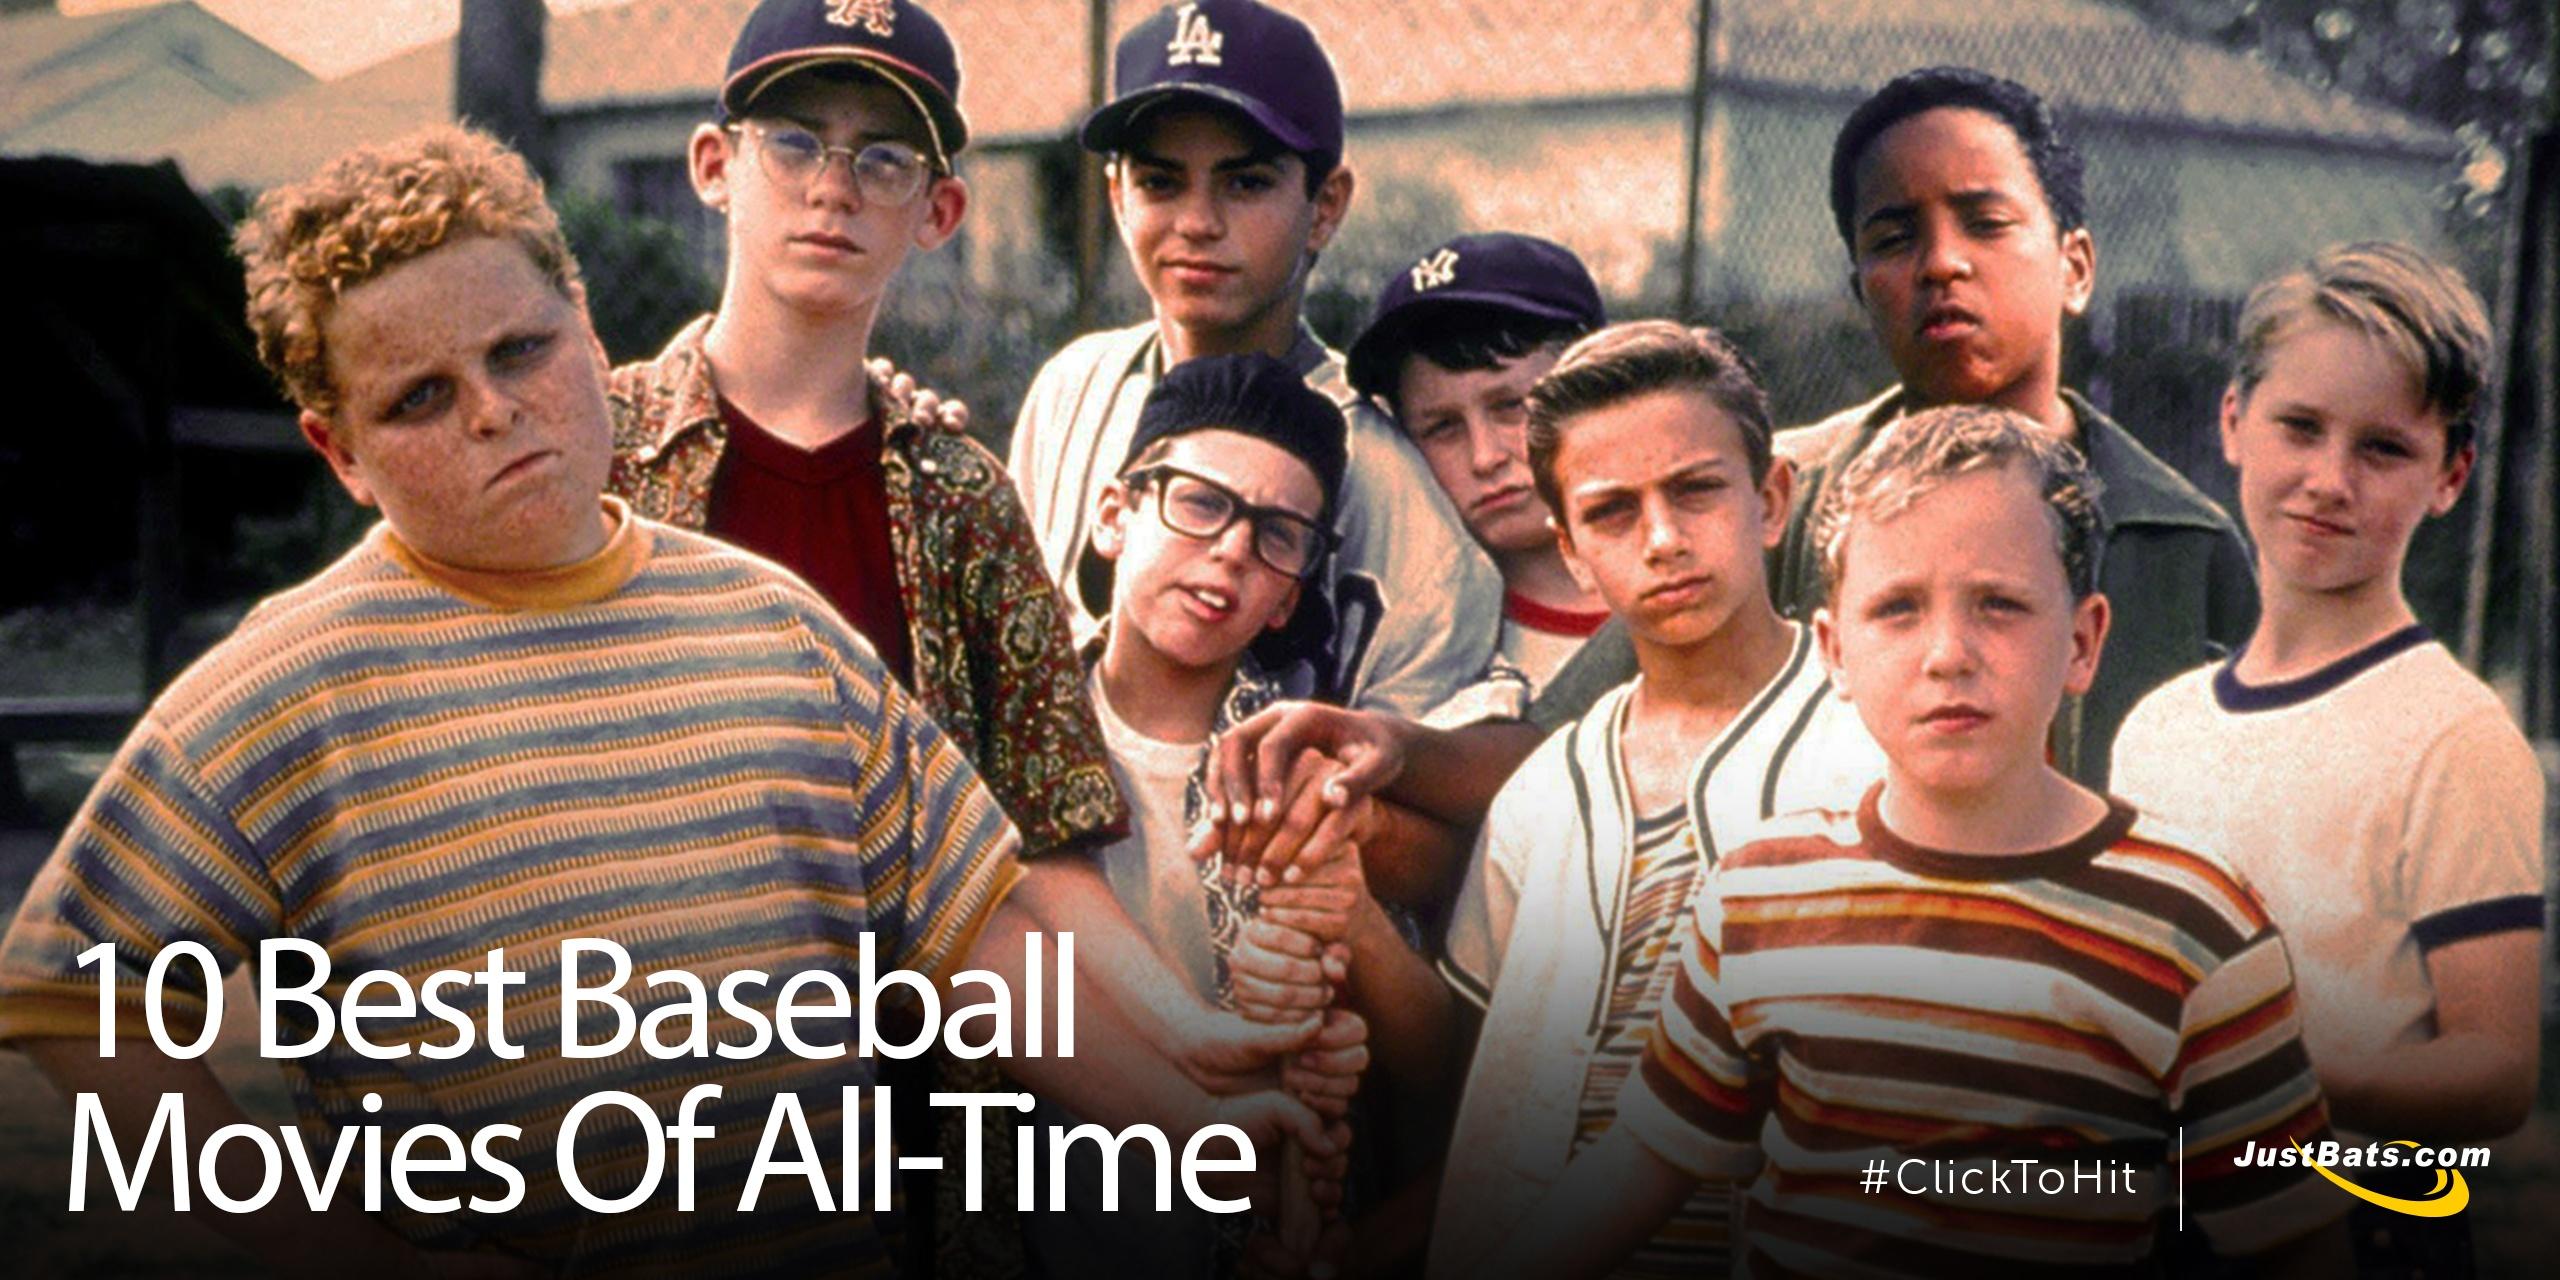 10 Best Baseball Movies - Blog.jpg